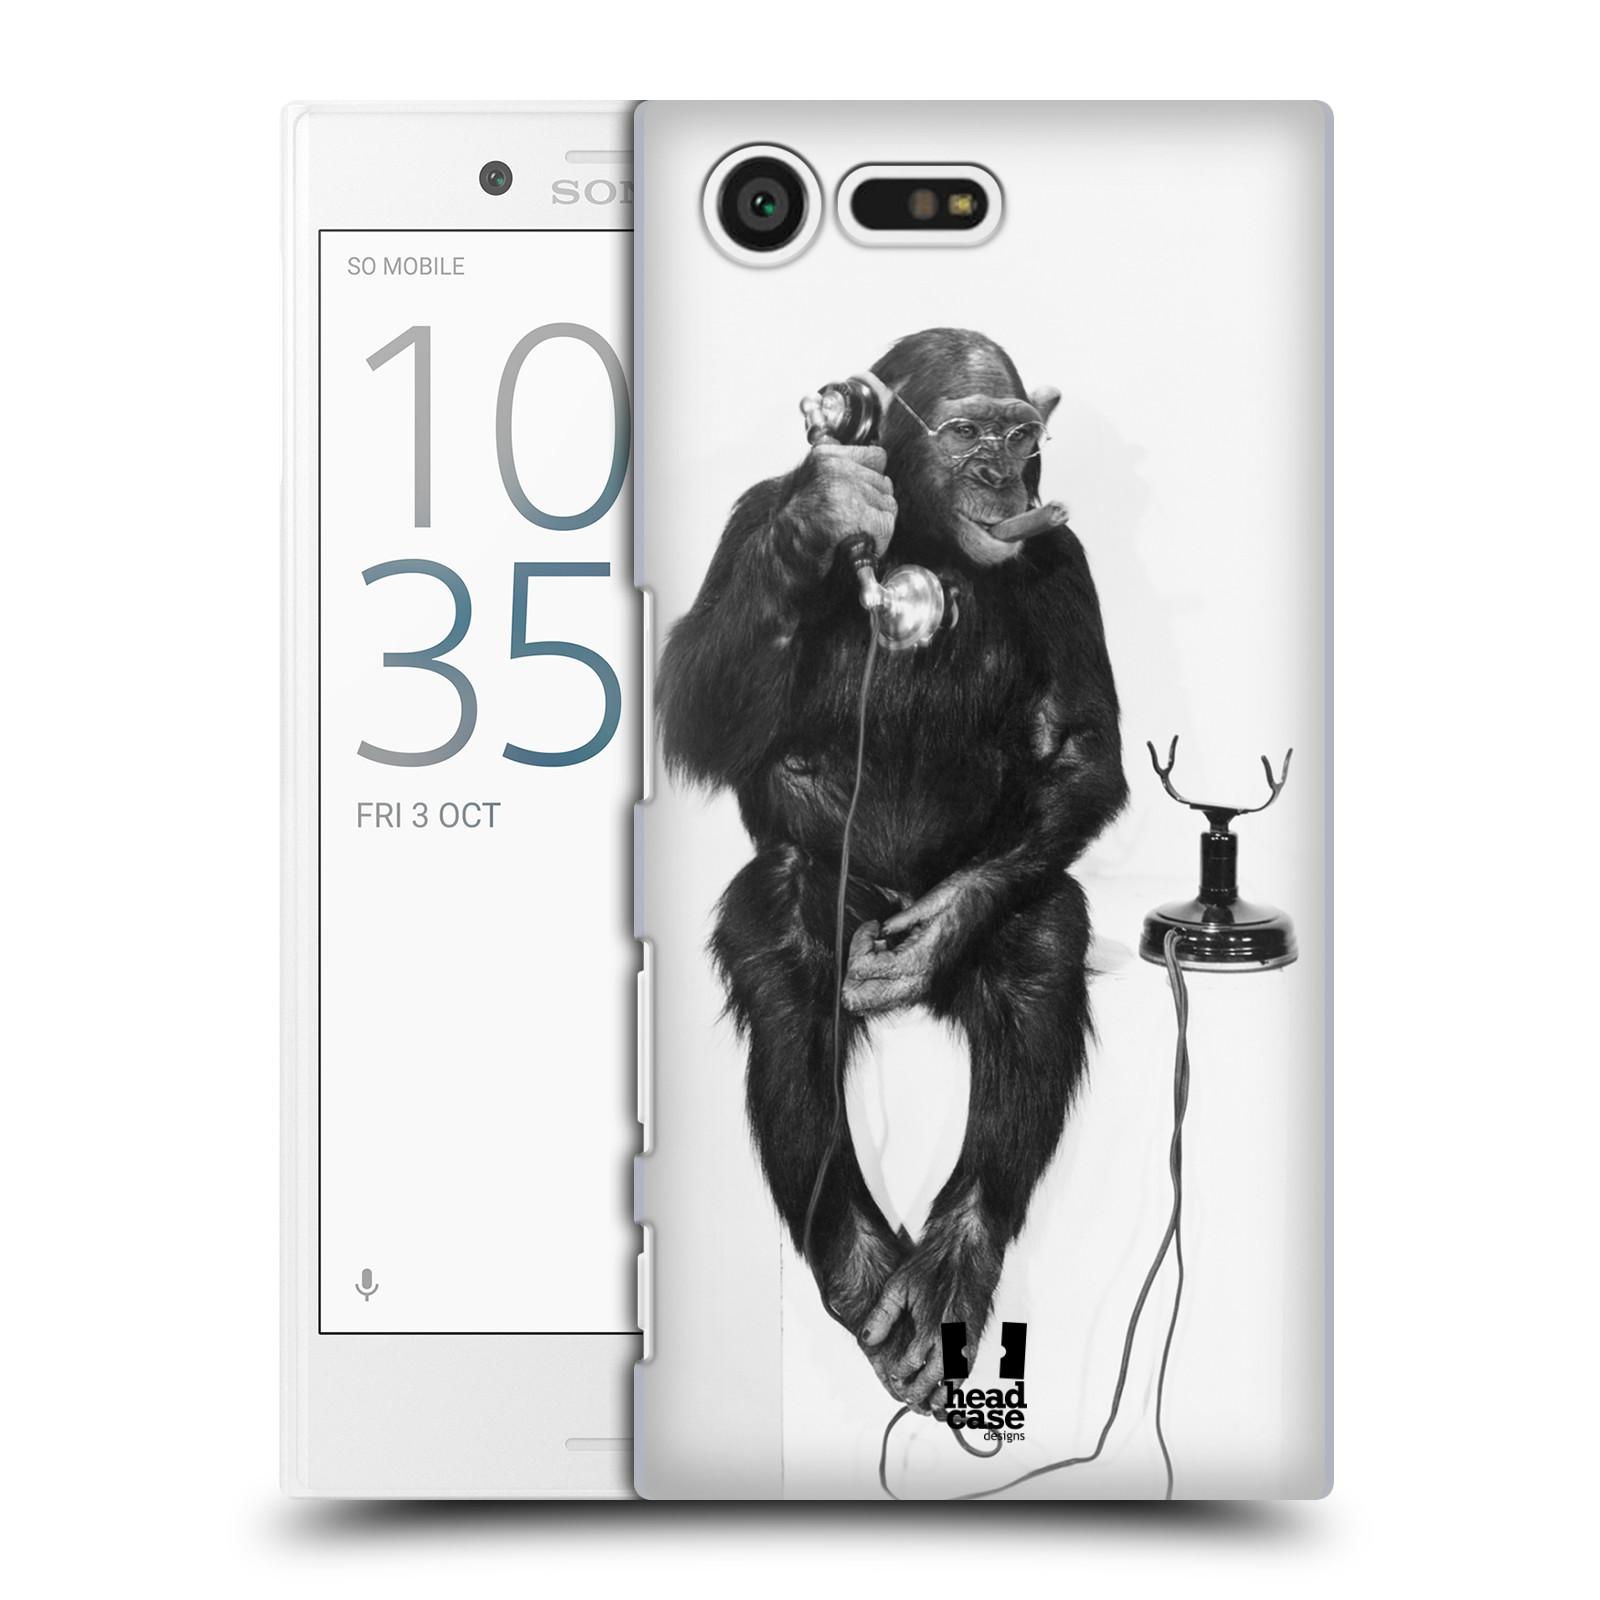 Plastové pouzdro na mobil Sony Xperia X Compact HEAD CASE OPIČÁK S TELEFONEM (Plastový kryt či obal na mobilní telefon Sony Xperia X Compact F5321)